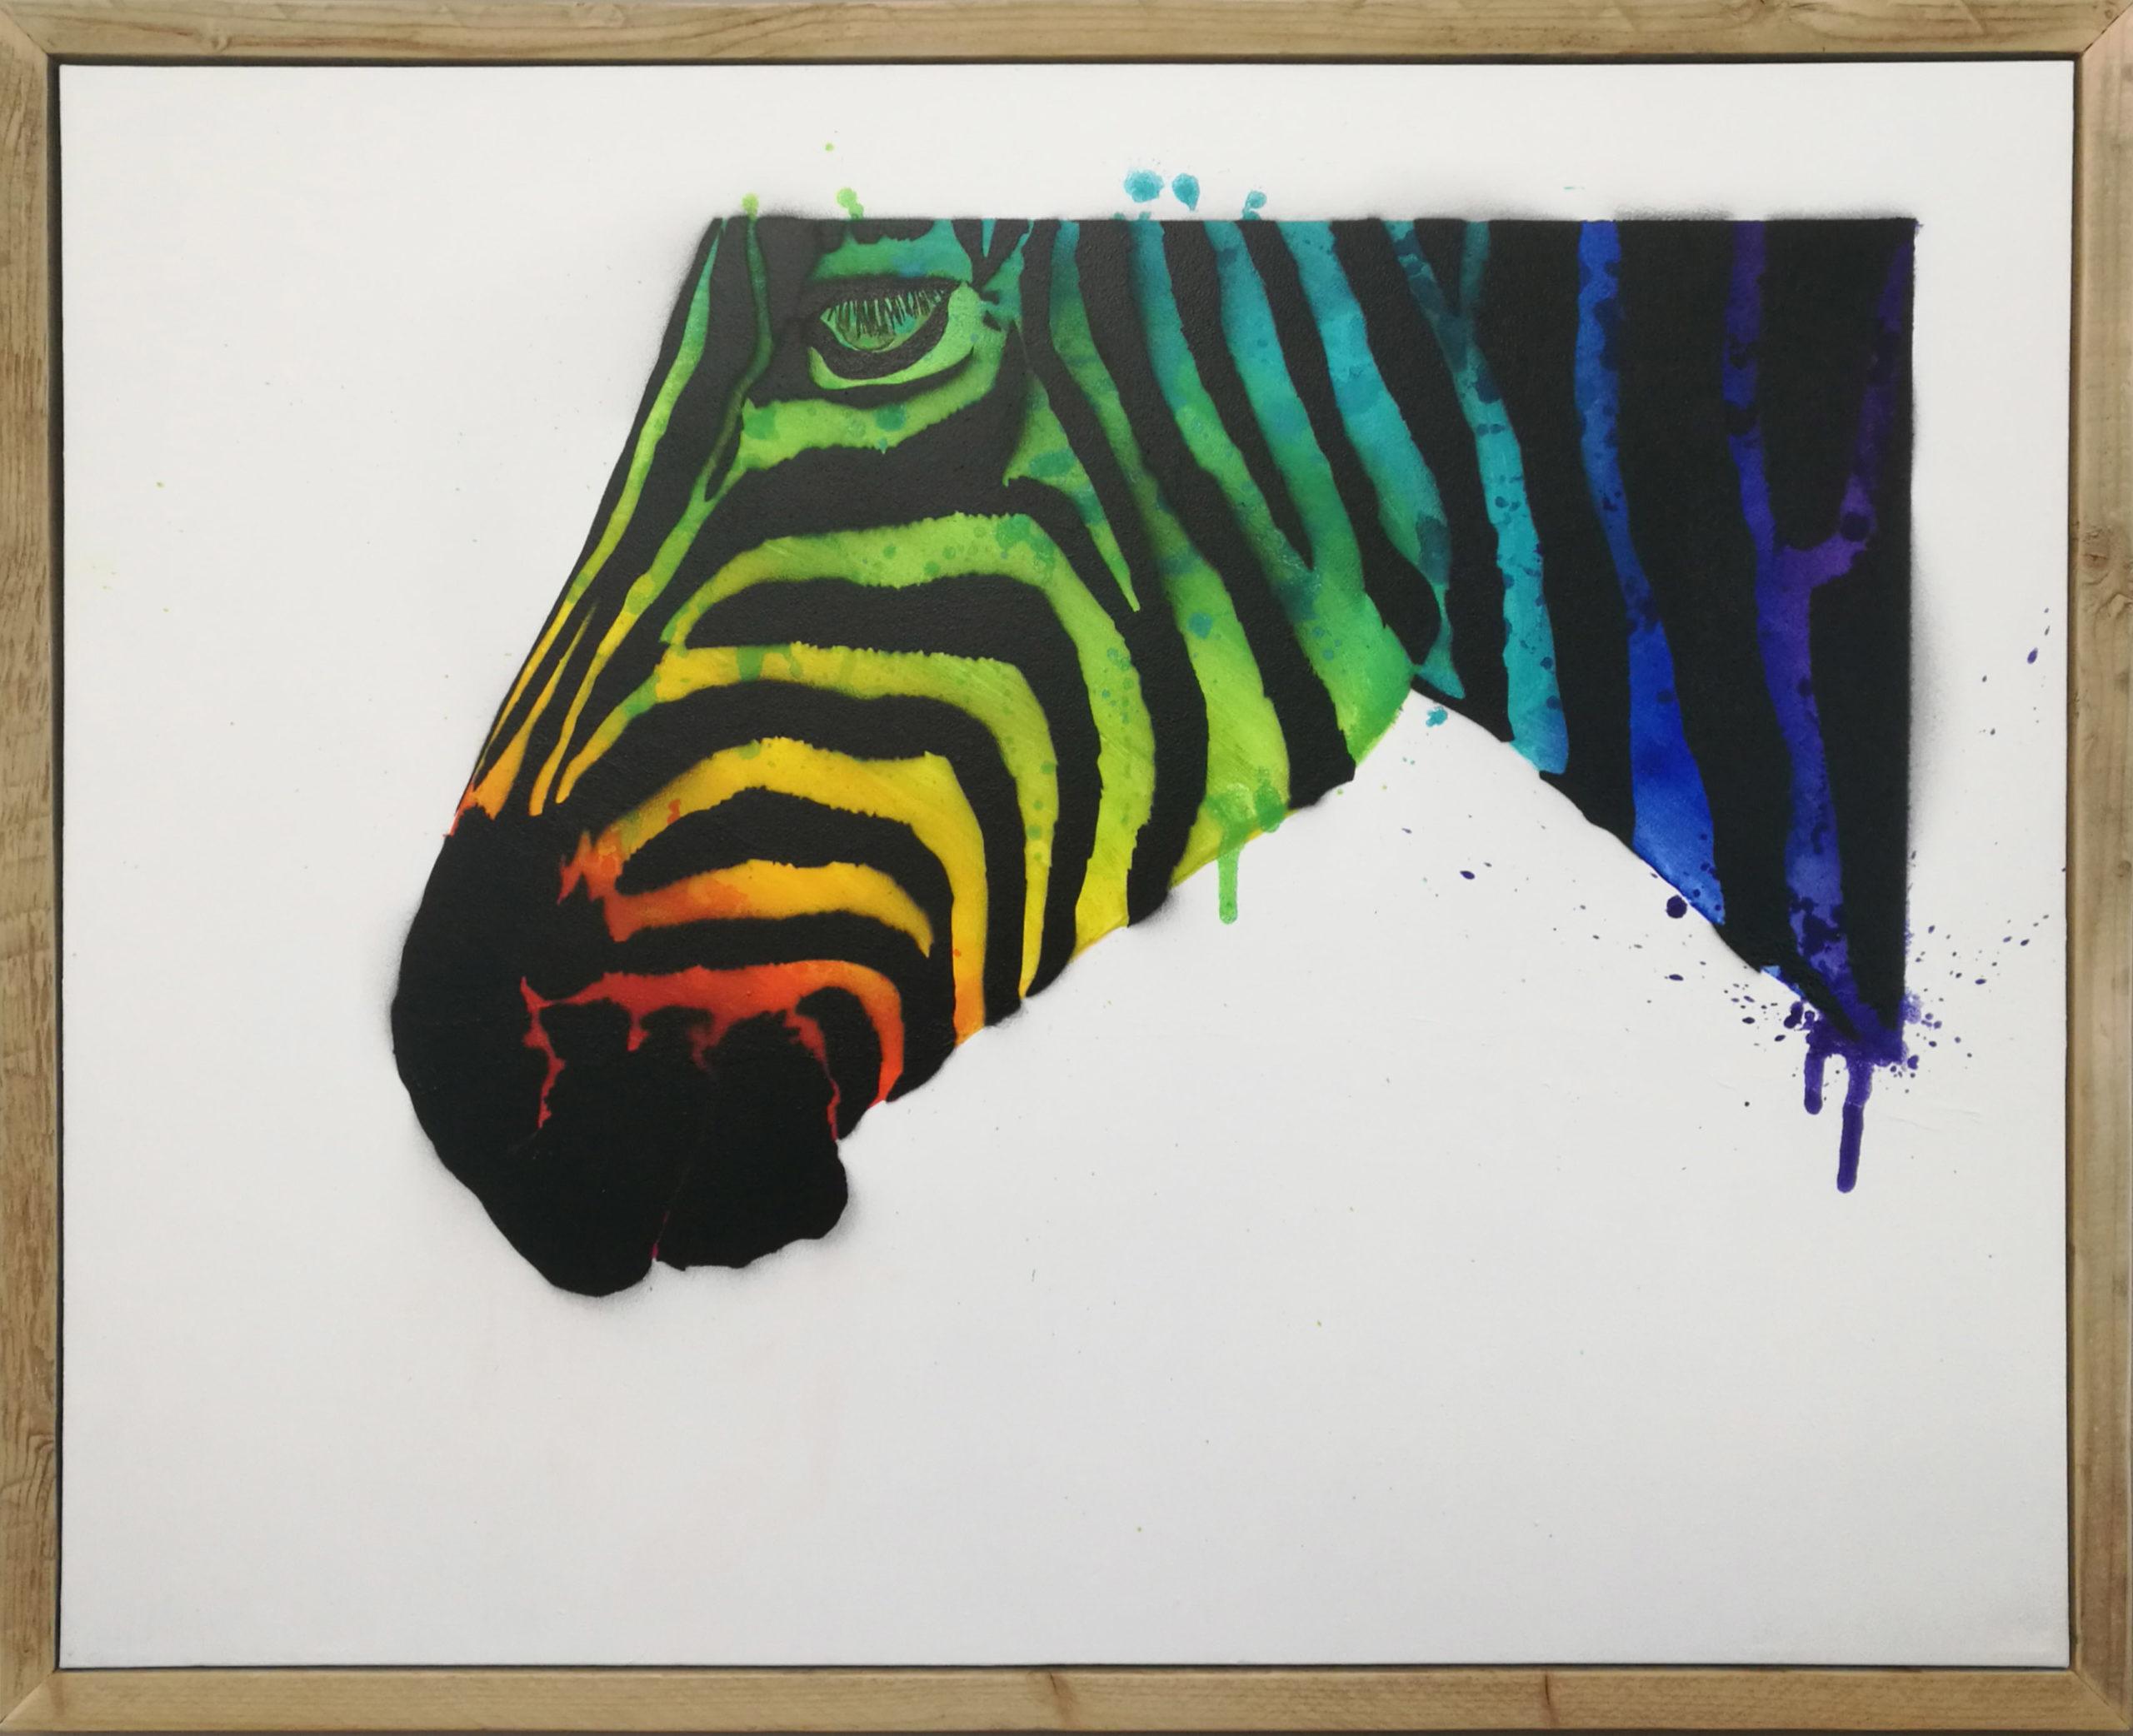 Stripes: Alt blir Zebra! 100 x 80 (Original 1/2) | Solgt